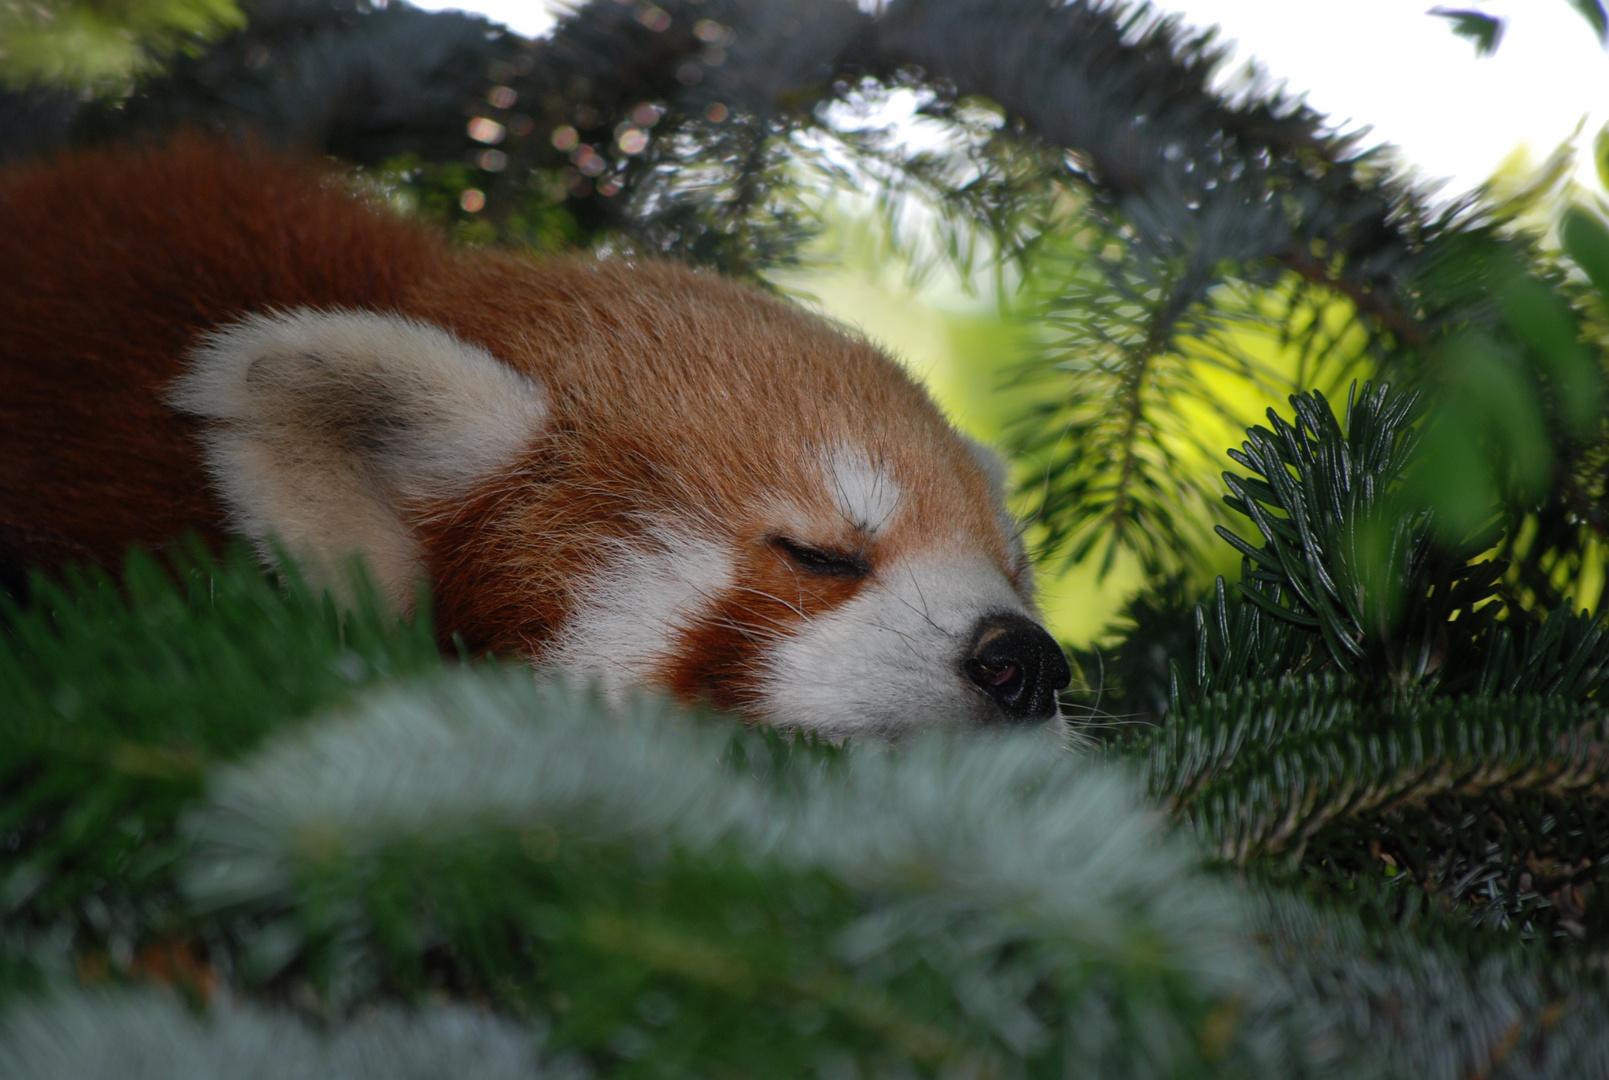 ho tanto sonno...